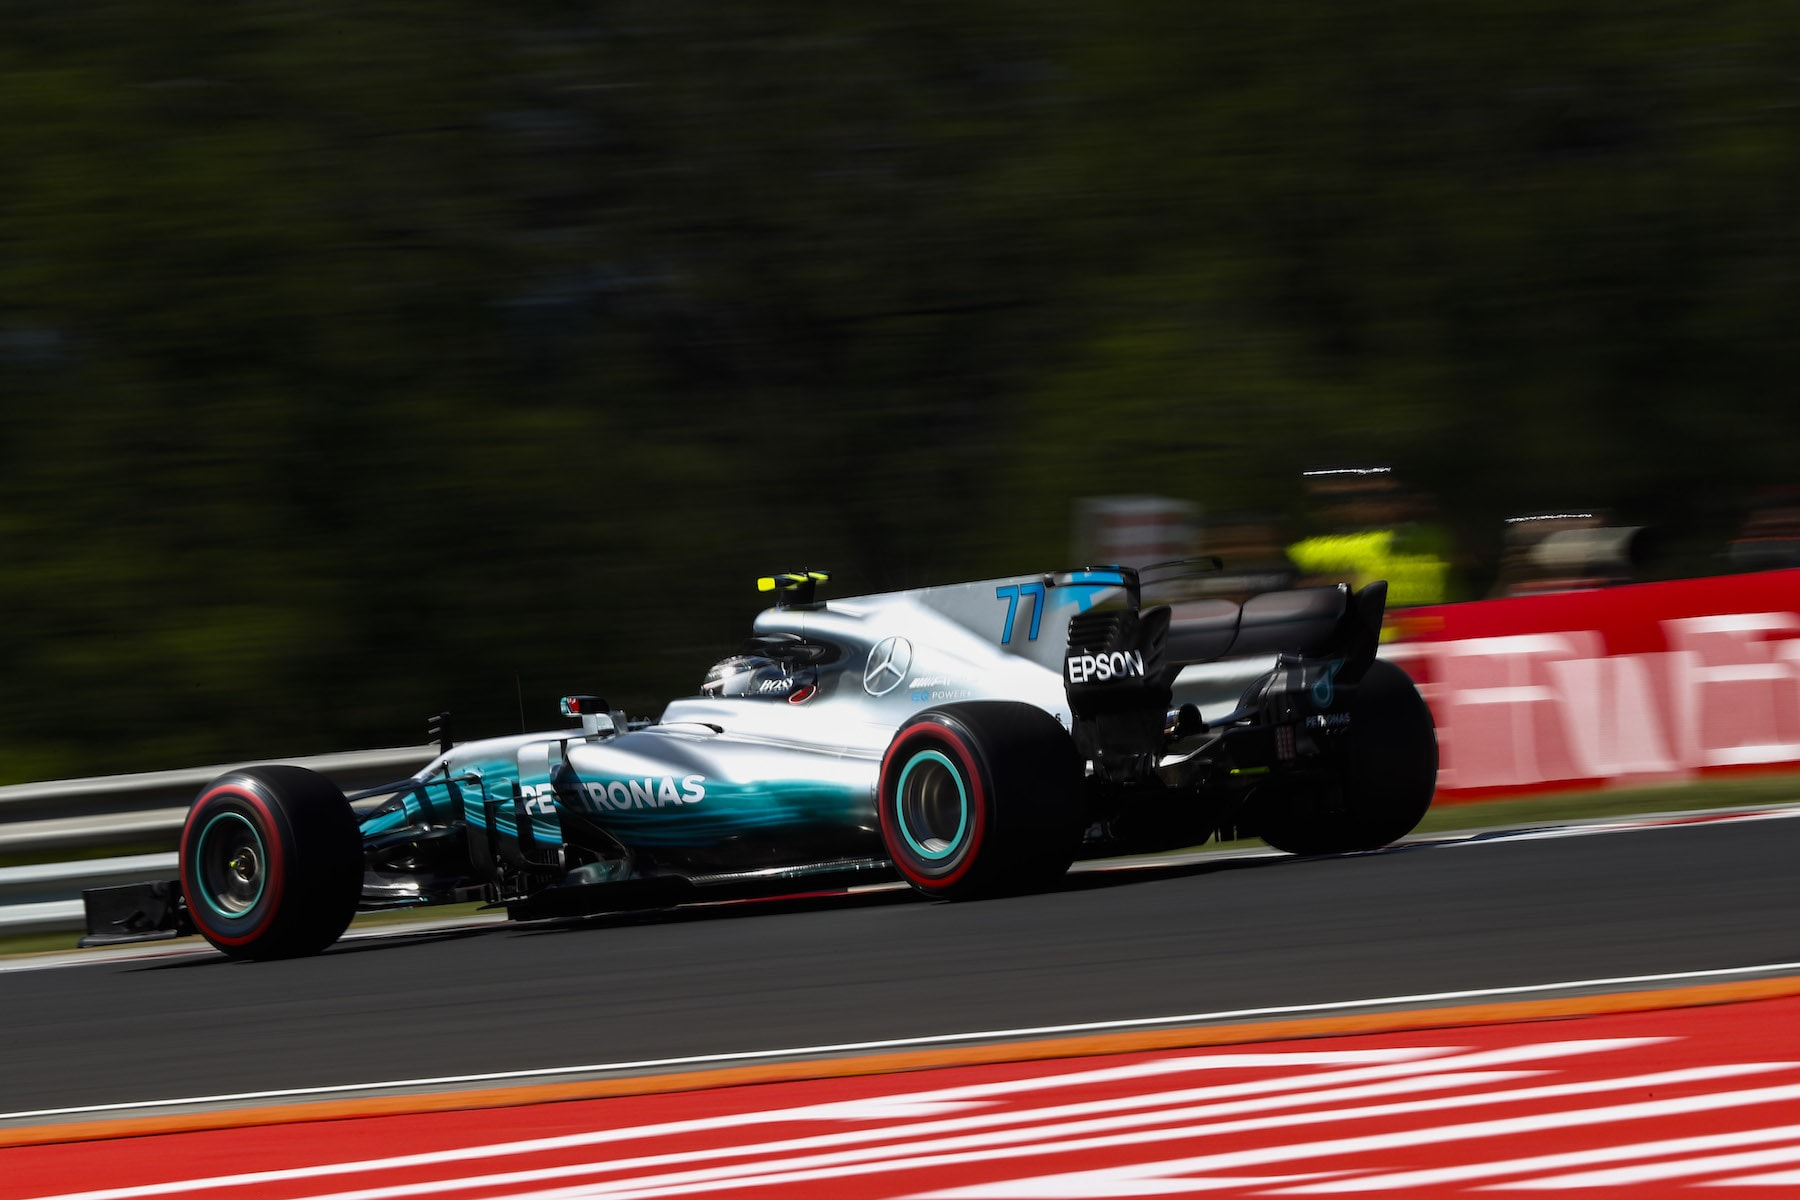 2017 Valtteri Bottas | Mercedes W08 | 2017 Hungarian GP Q3 P3 1 copy.jpg